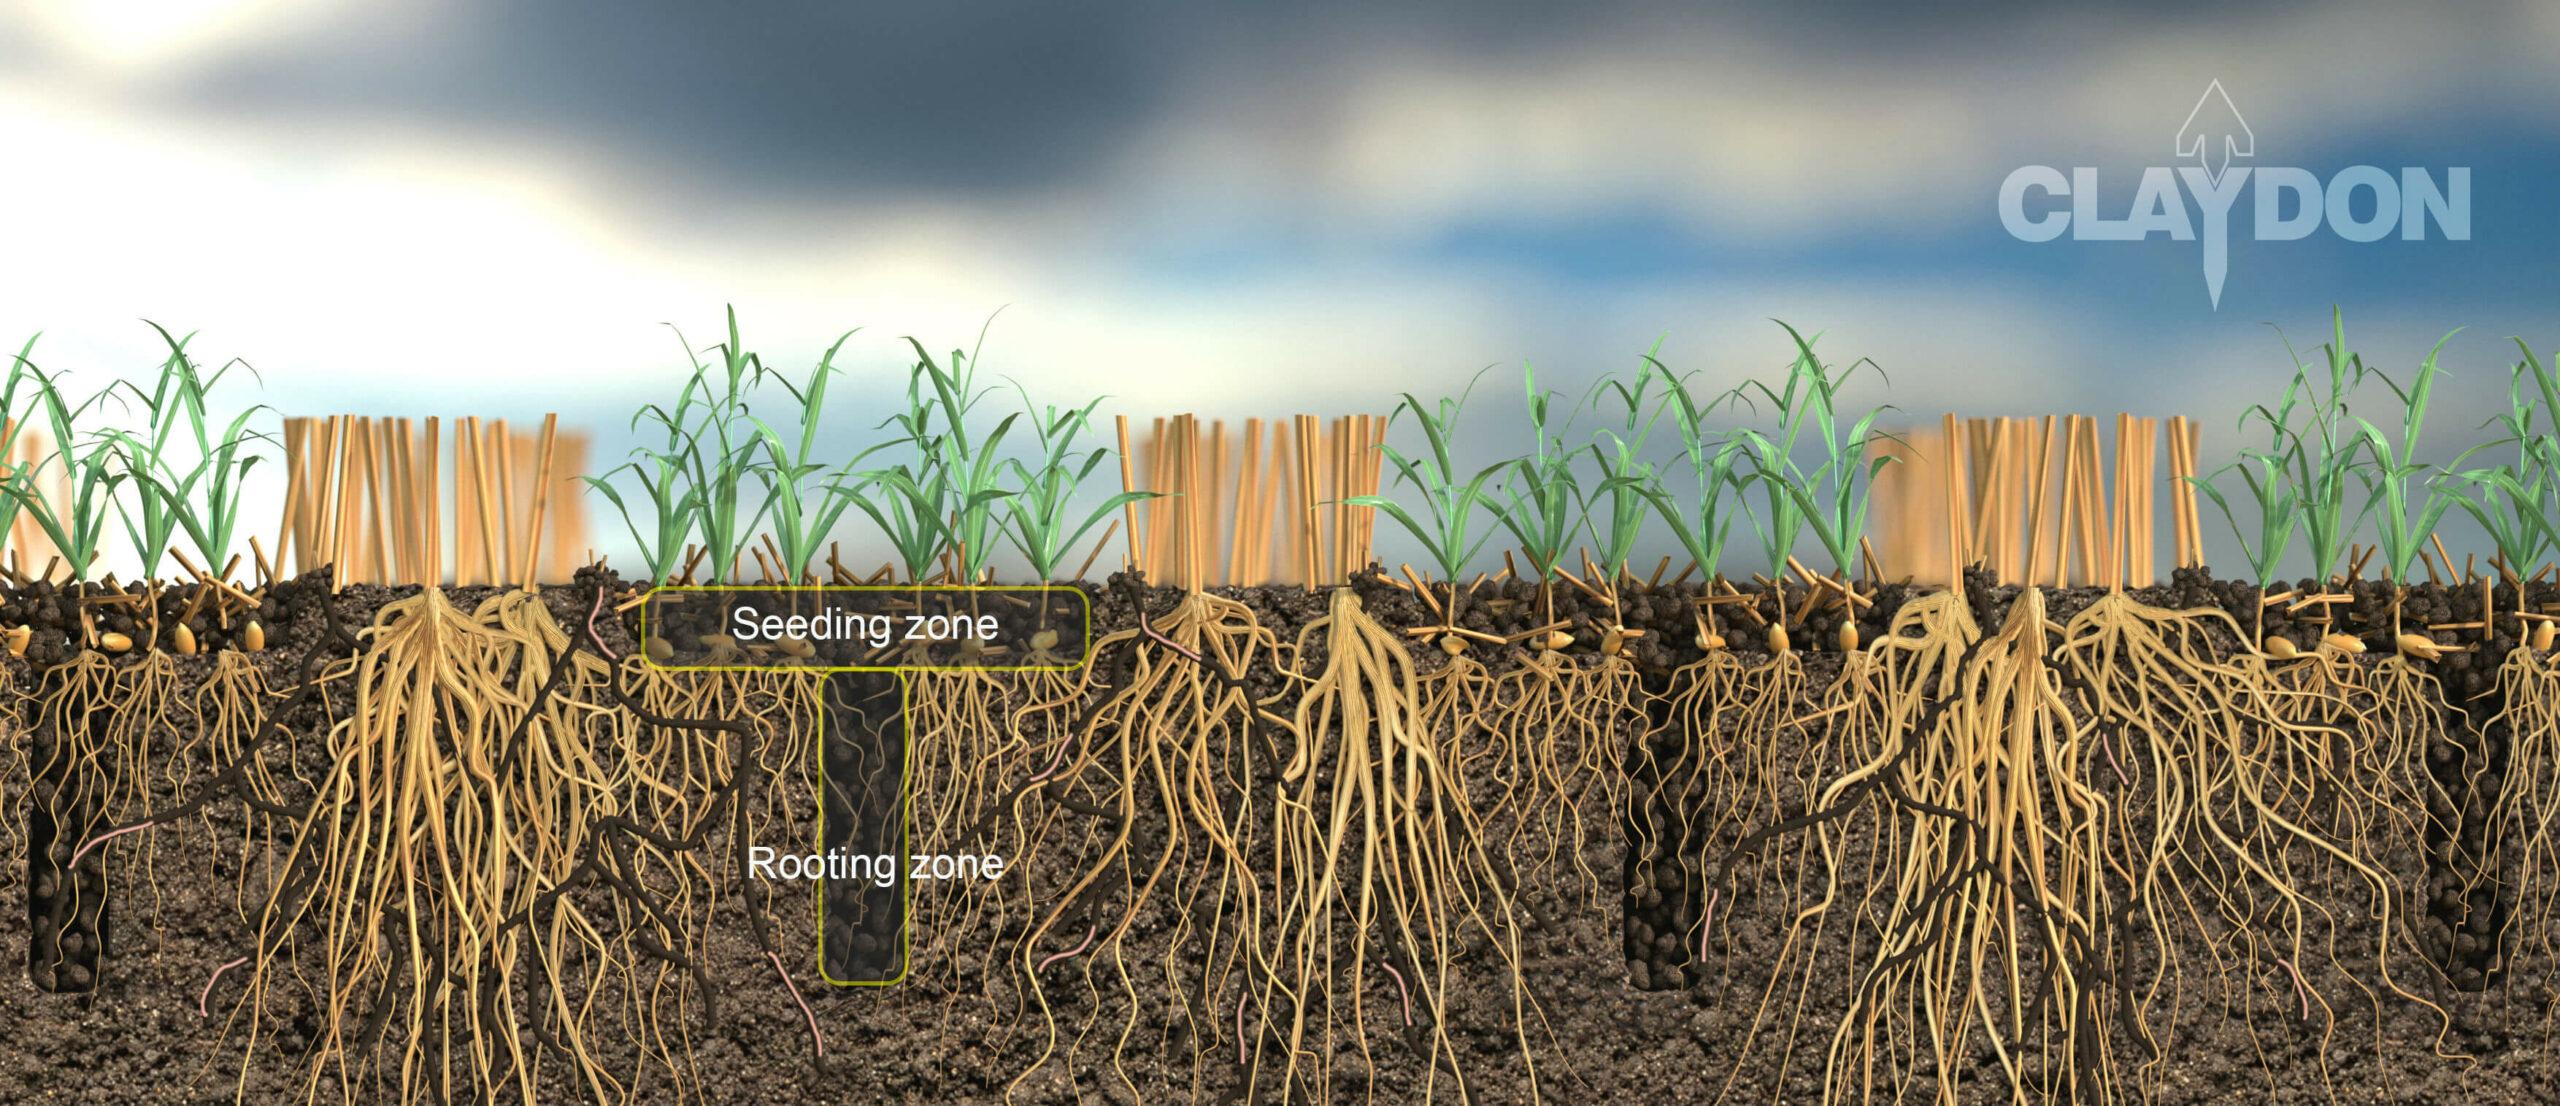 Claydon optimum soil loosening